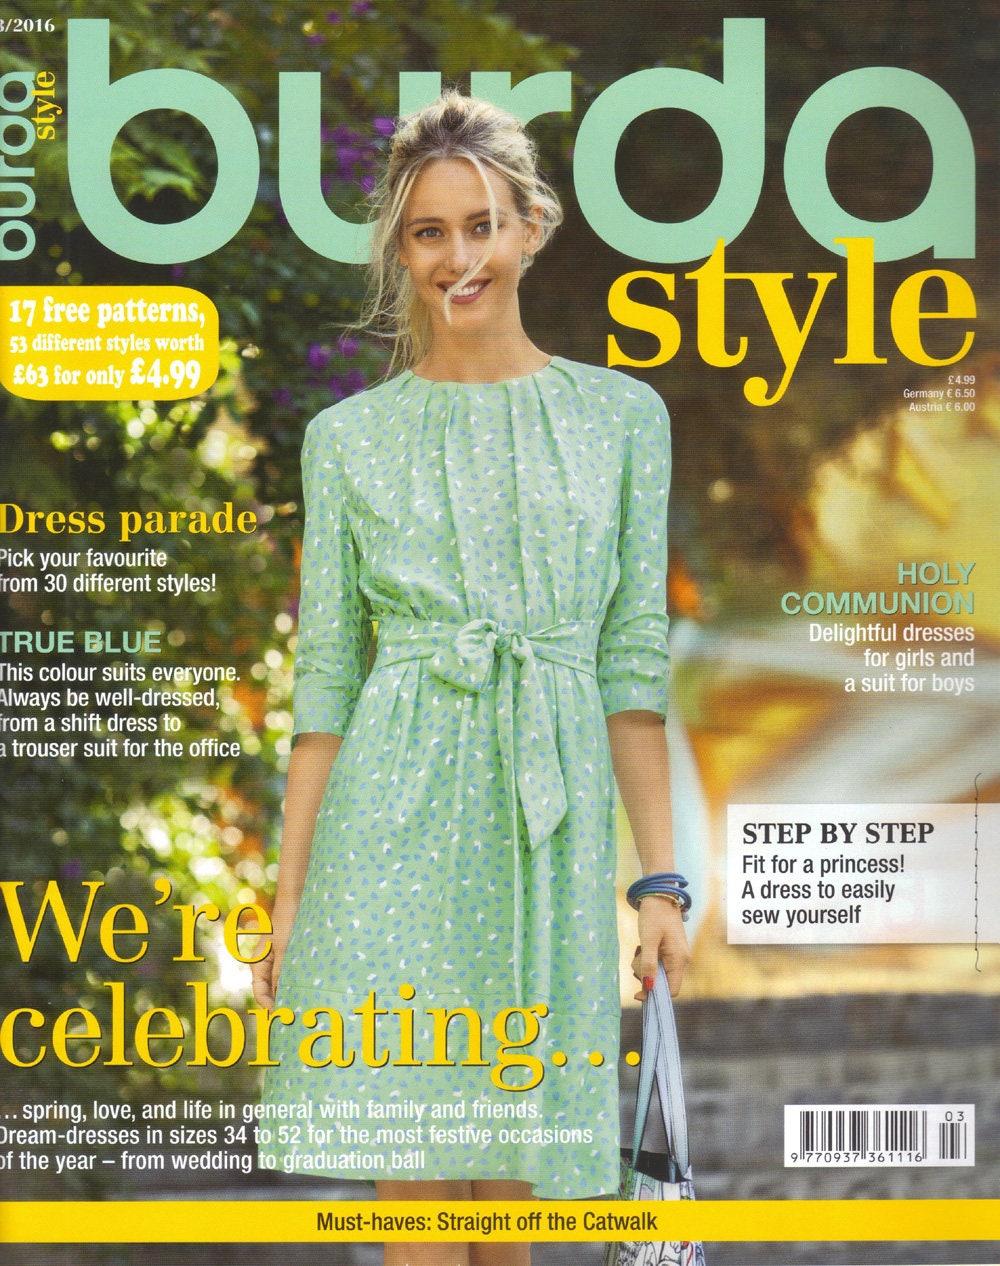 Burda style magazine 32016 english sewing patterns from get shipping estimate jeuxipadfo Image collections